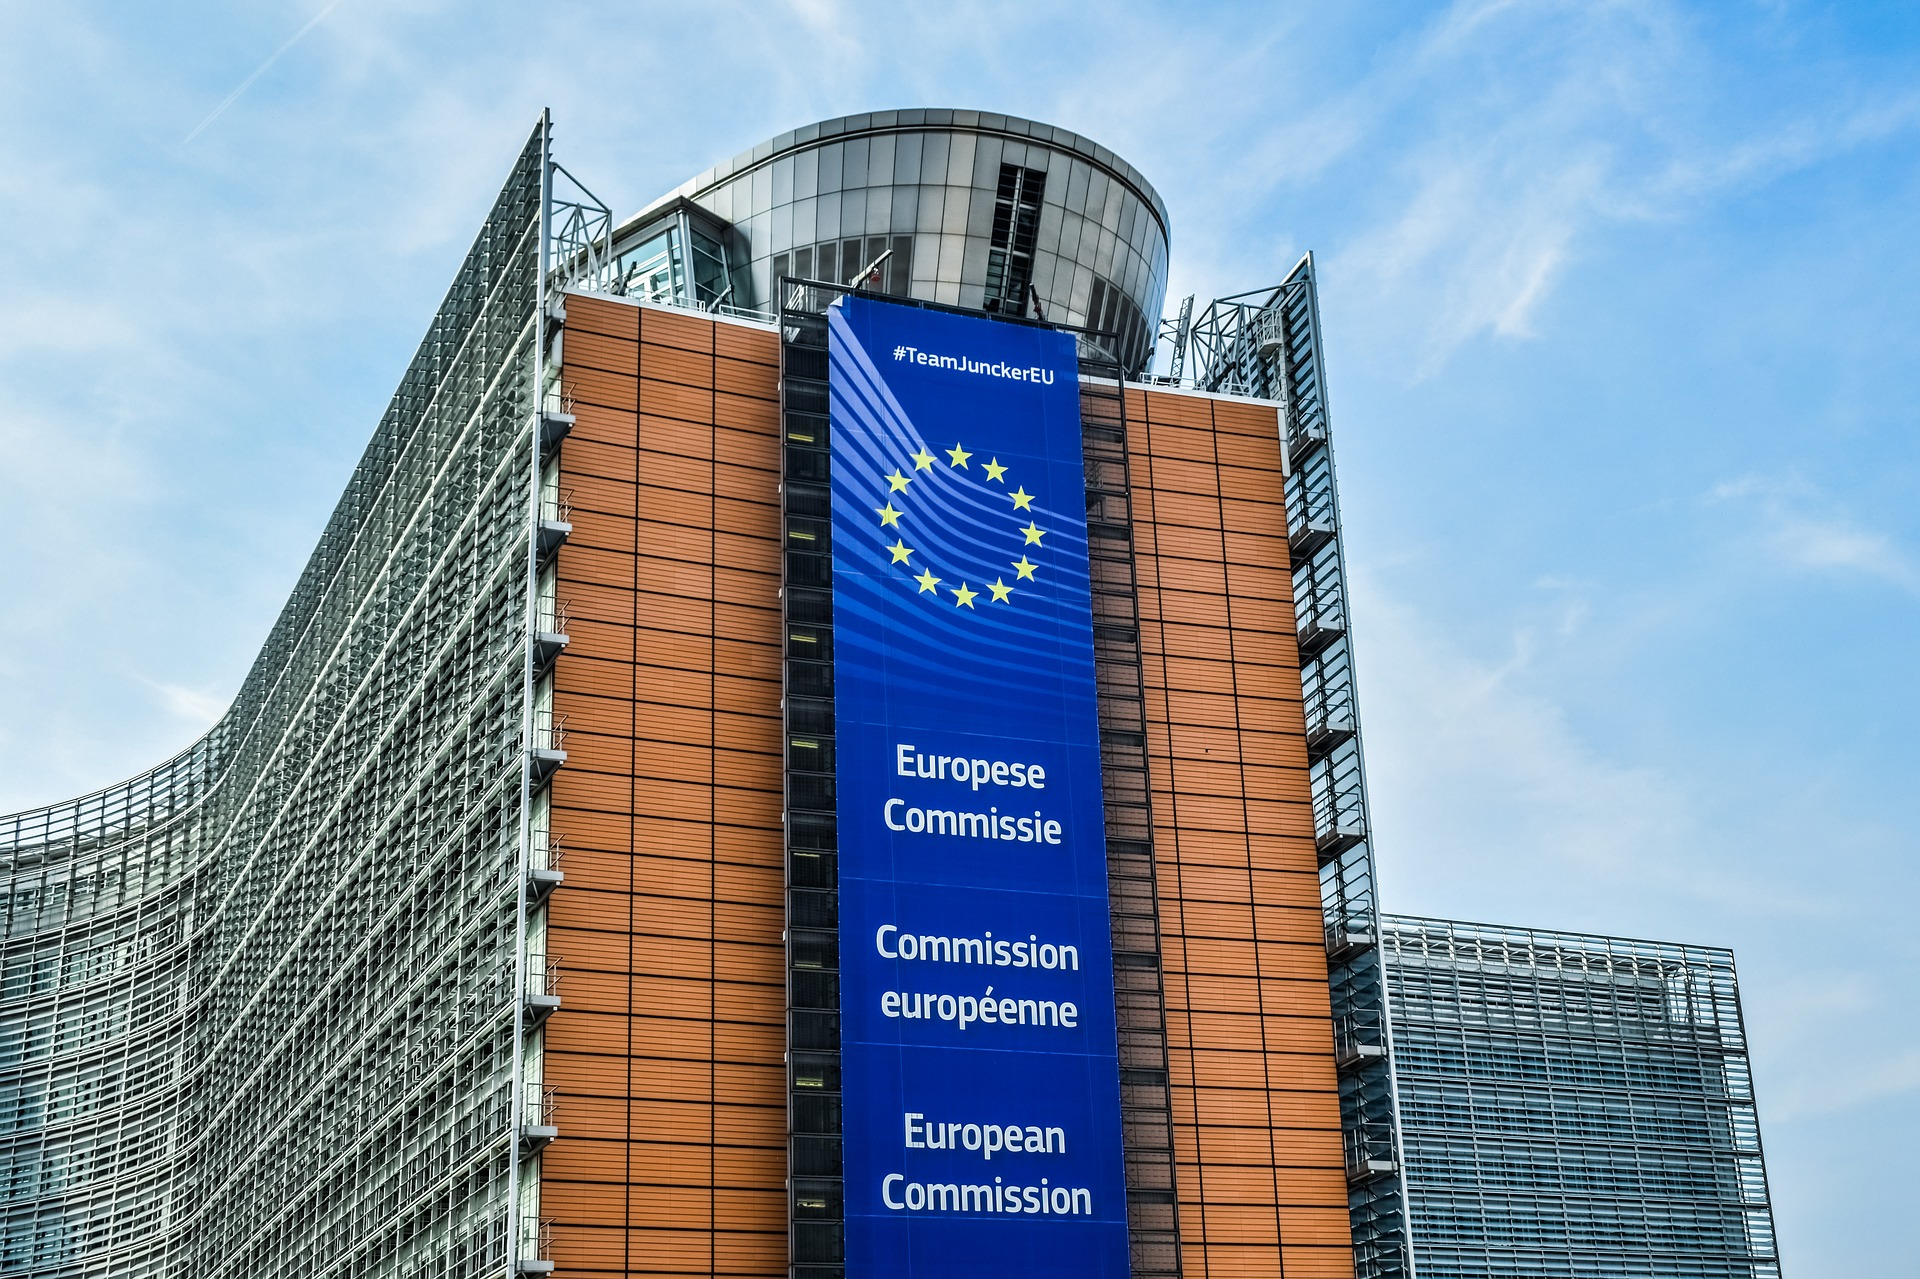 File:European Commission.jpg - Wikimedia Commons